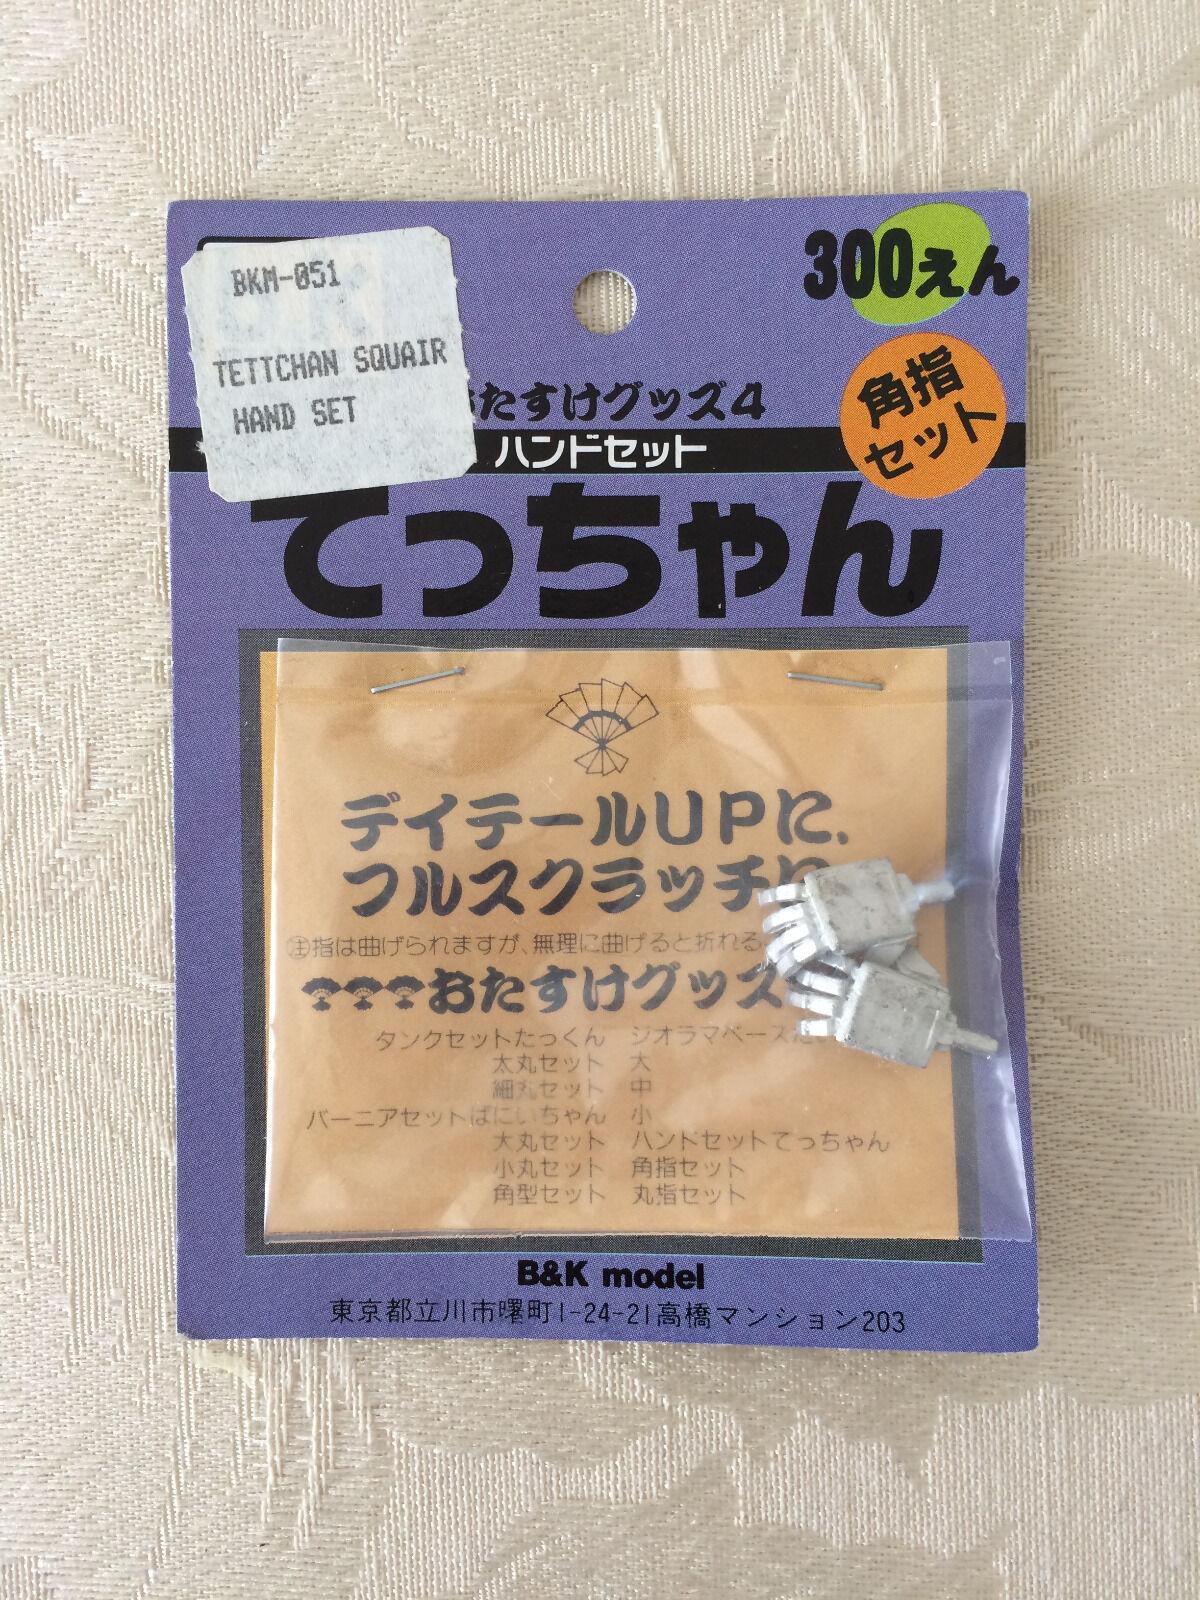 B &K modellllerlerl Metal Gundam   Robot Hand Set Gunpla Congrönion Pkonsts Lot 13